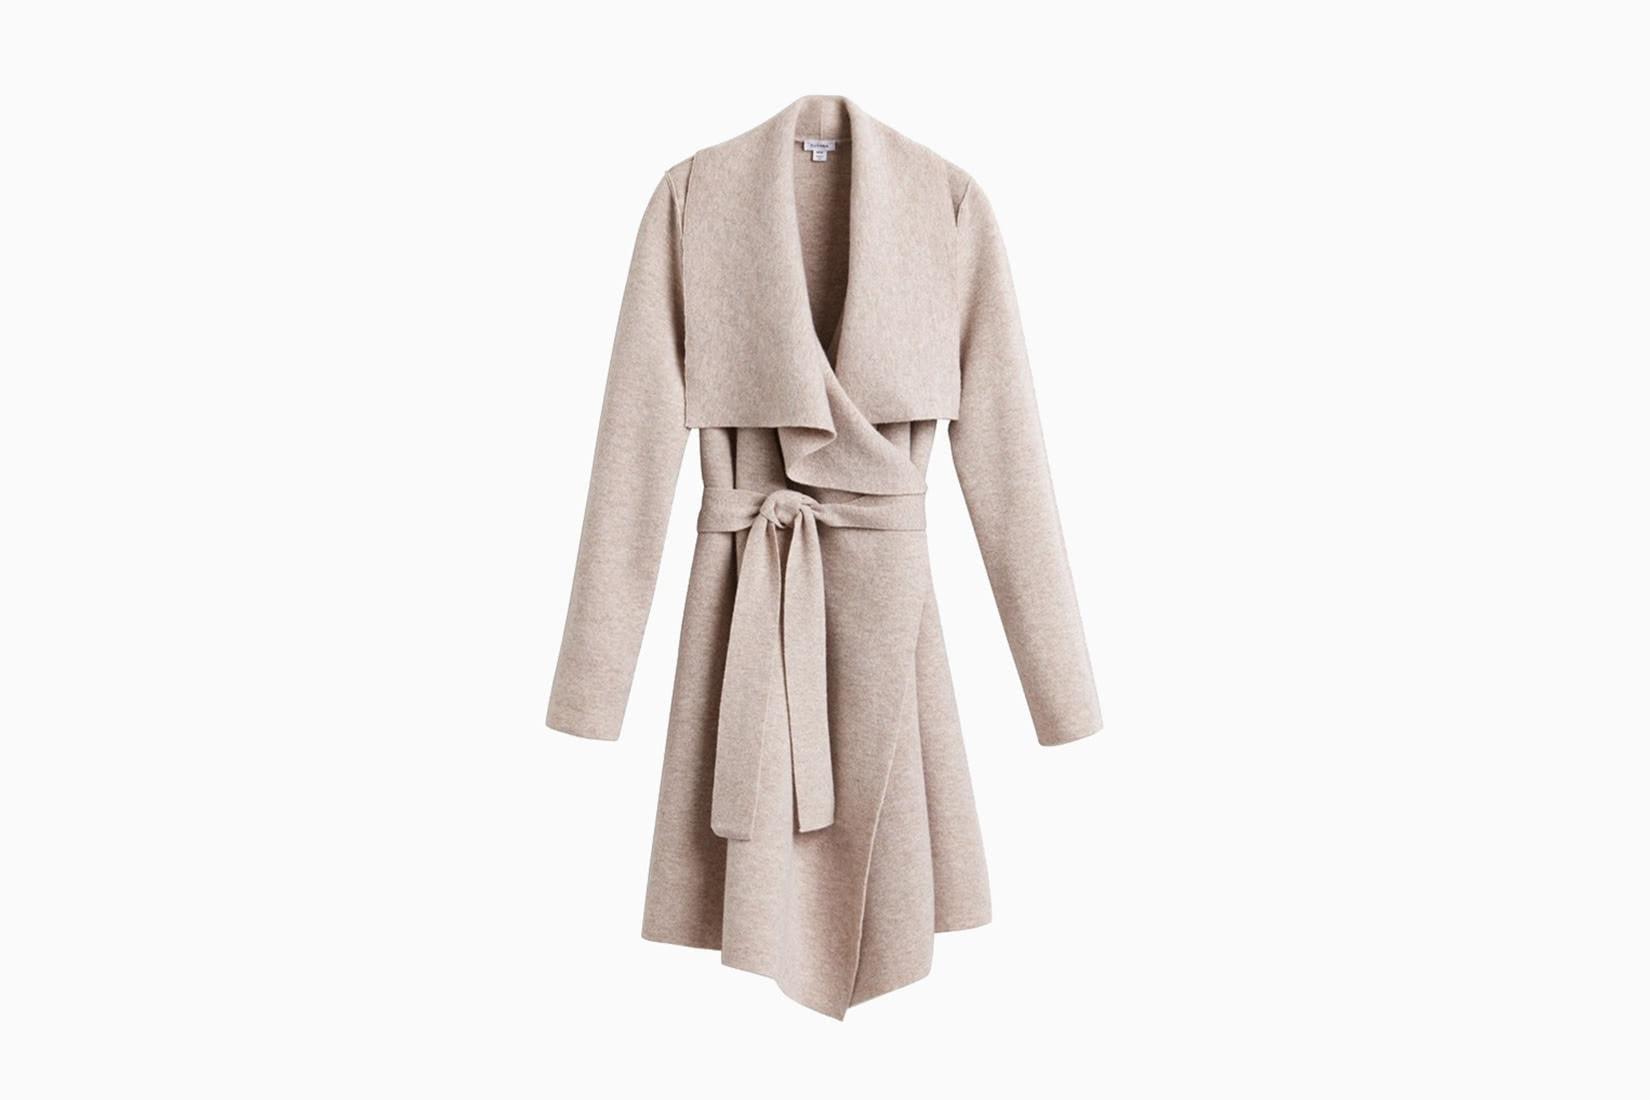 best winter coats women cuyana short wrap review - Luxe Digital